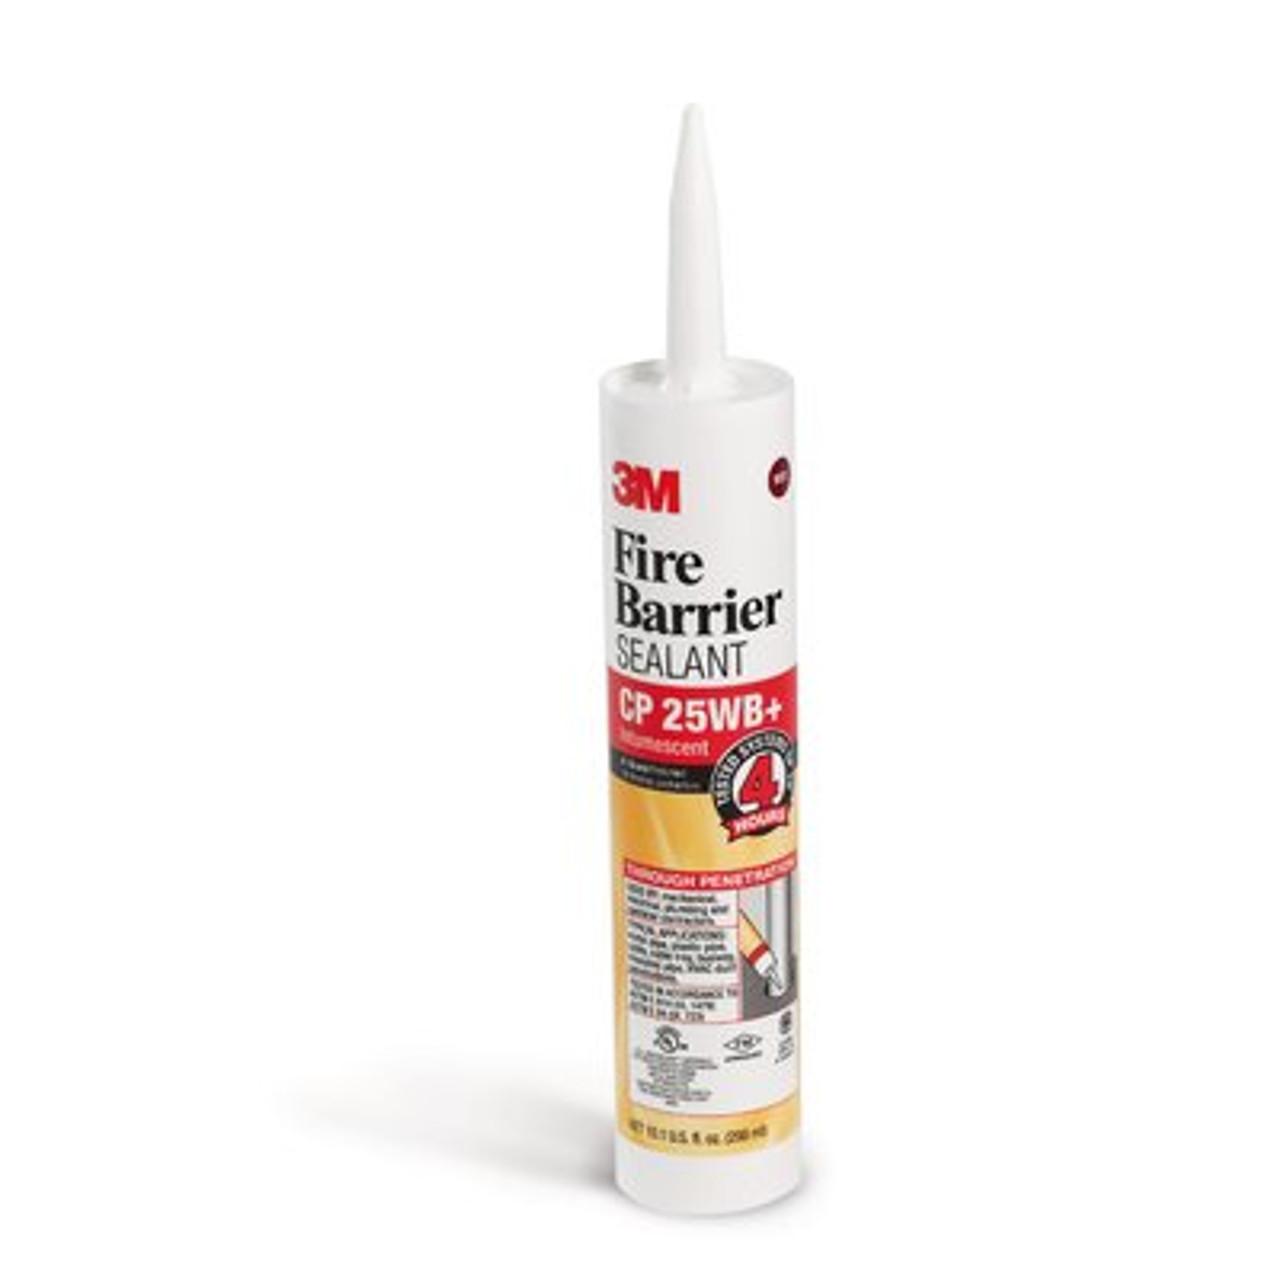 3M™ Fire Barrier Sealant CP 25WB+, 10.1 fl. oz., Cartridge, 12/case